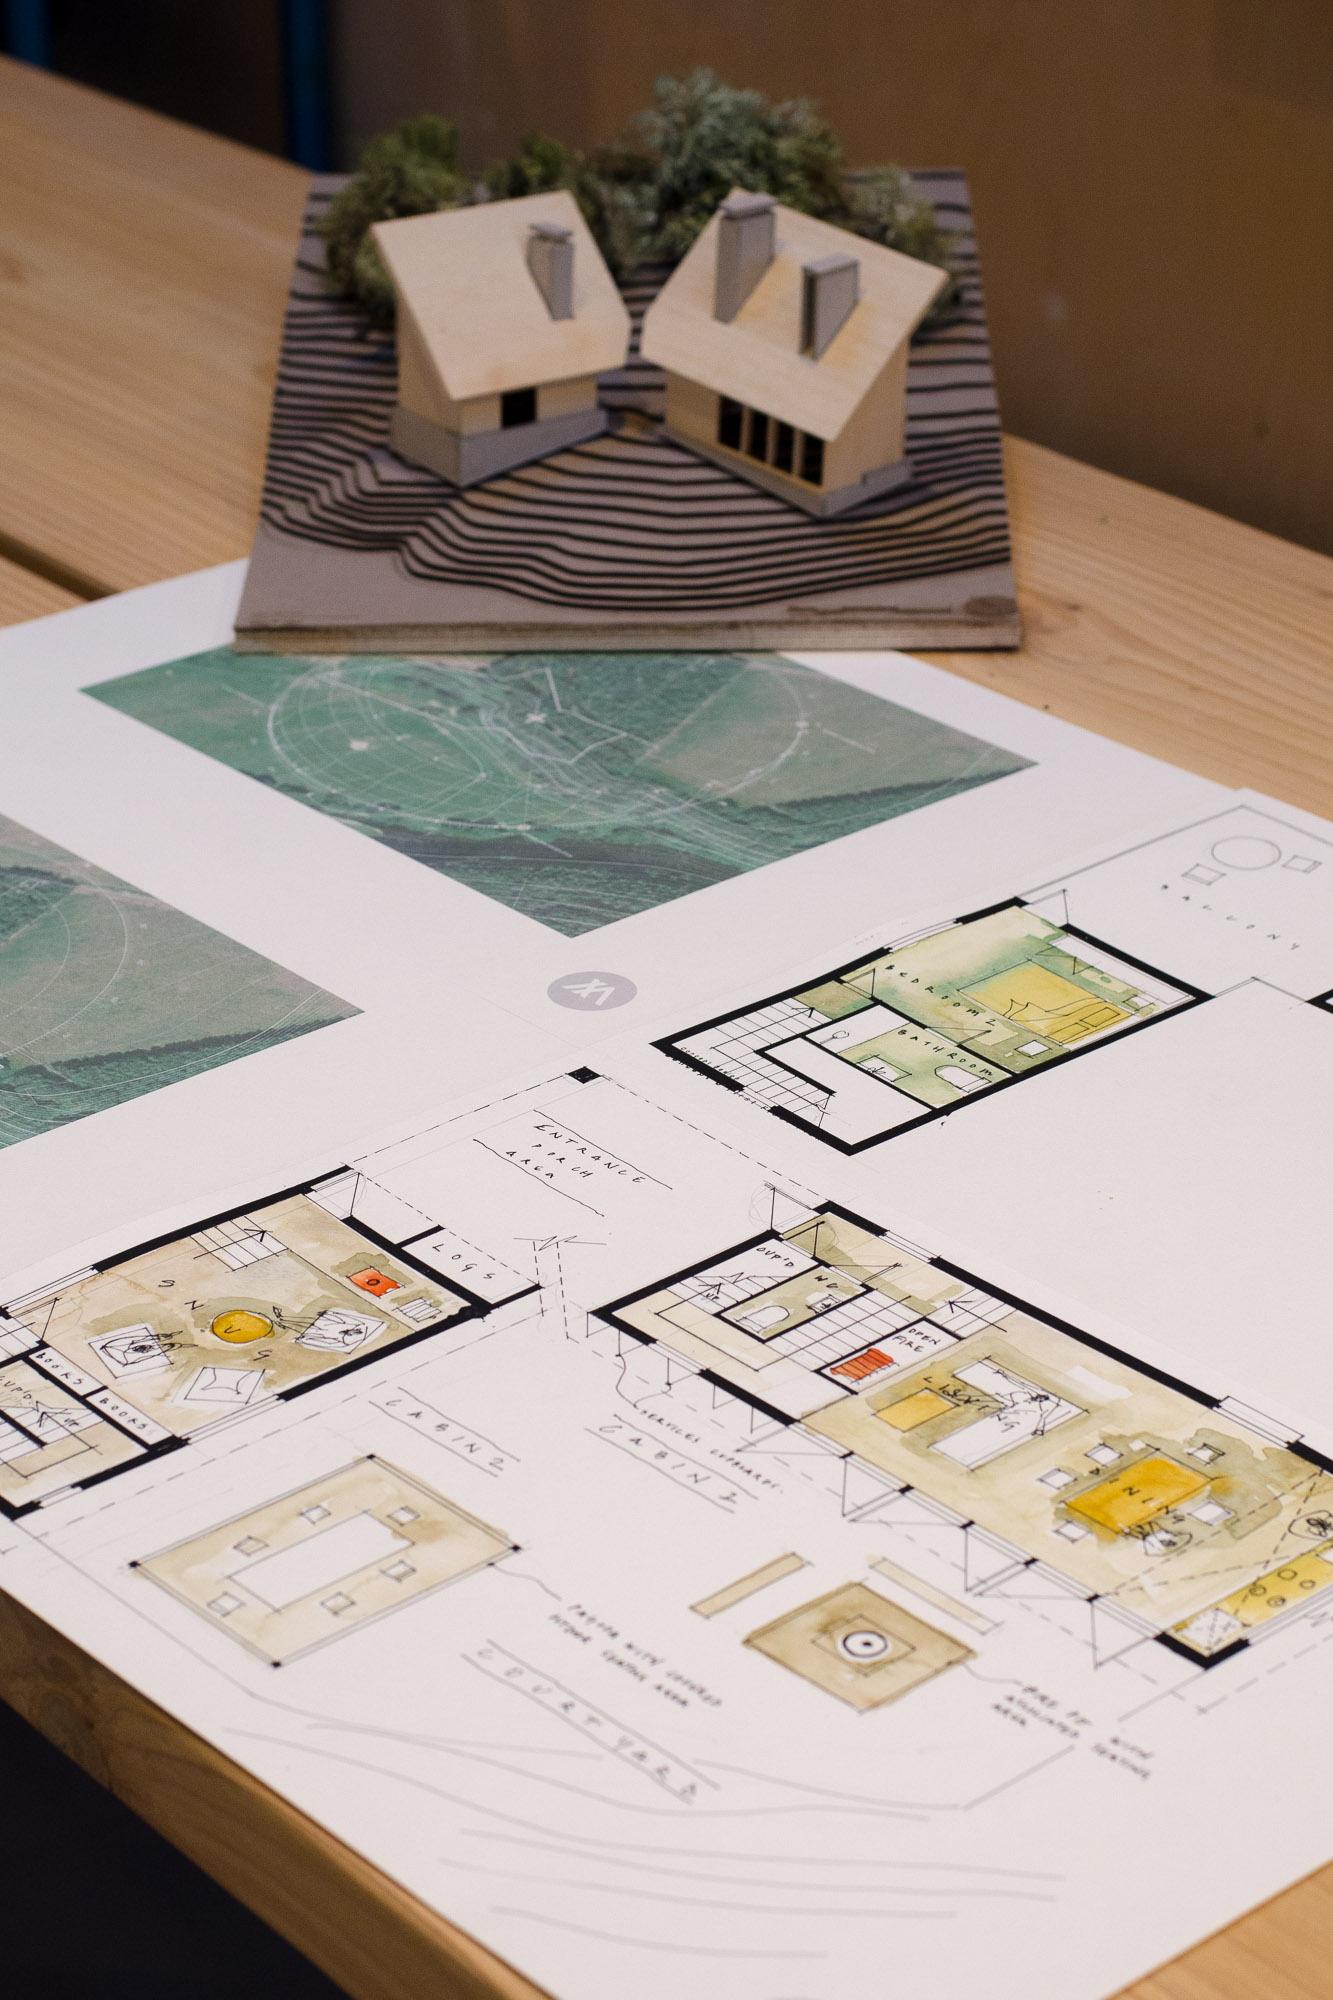 off-grid wooden cabin design sketch with model